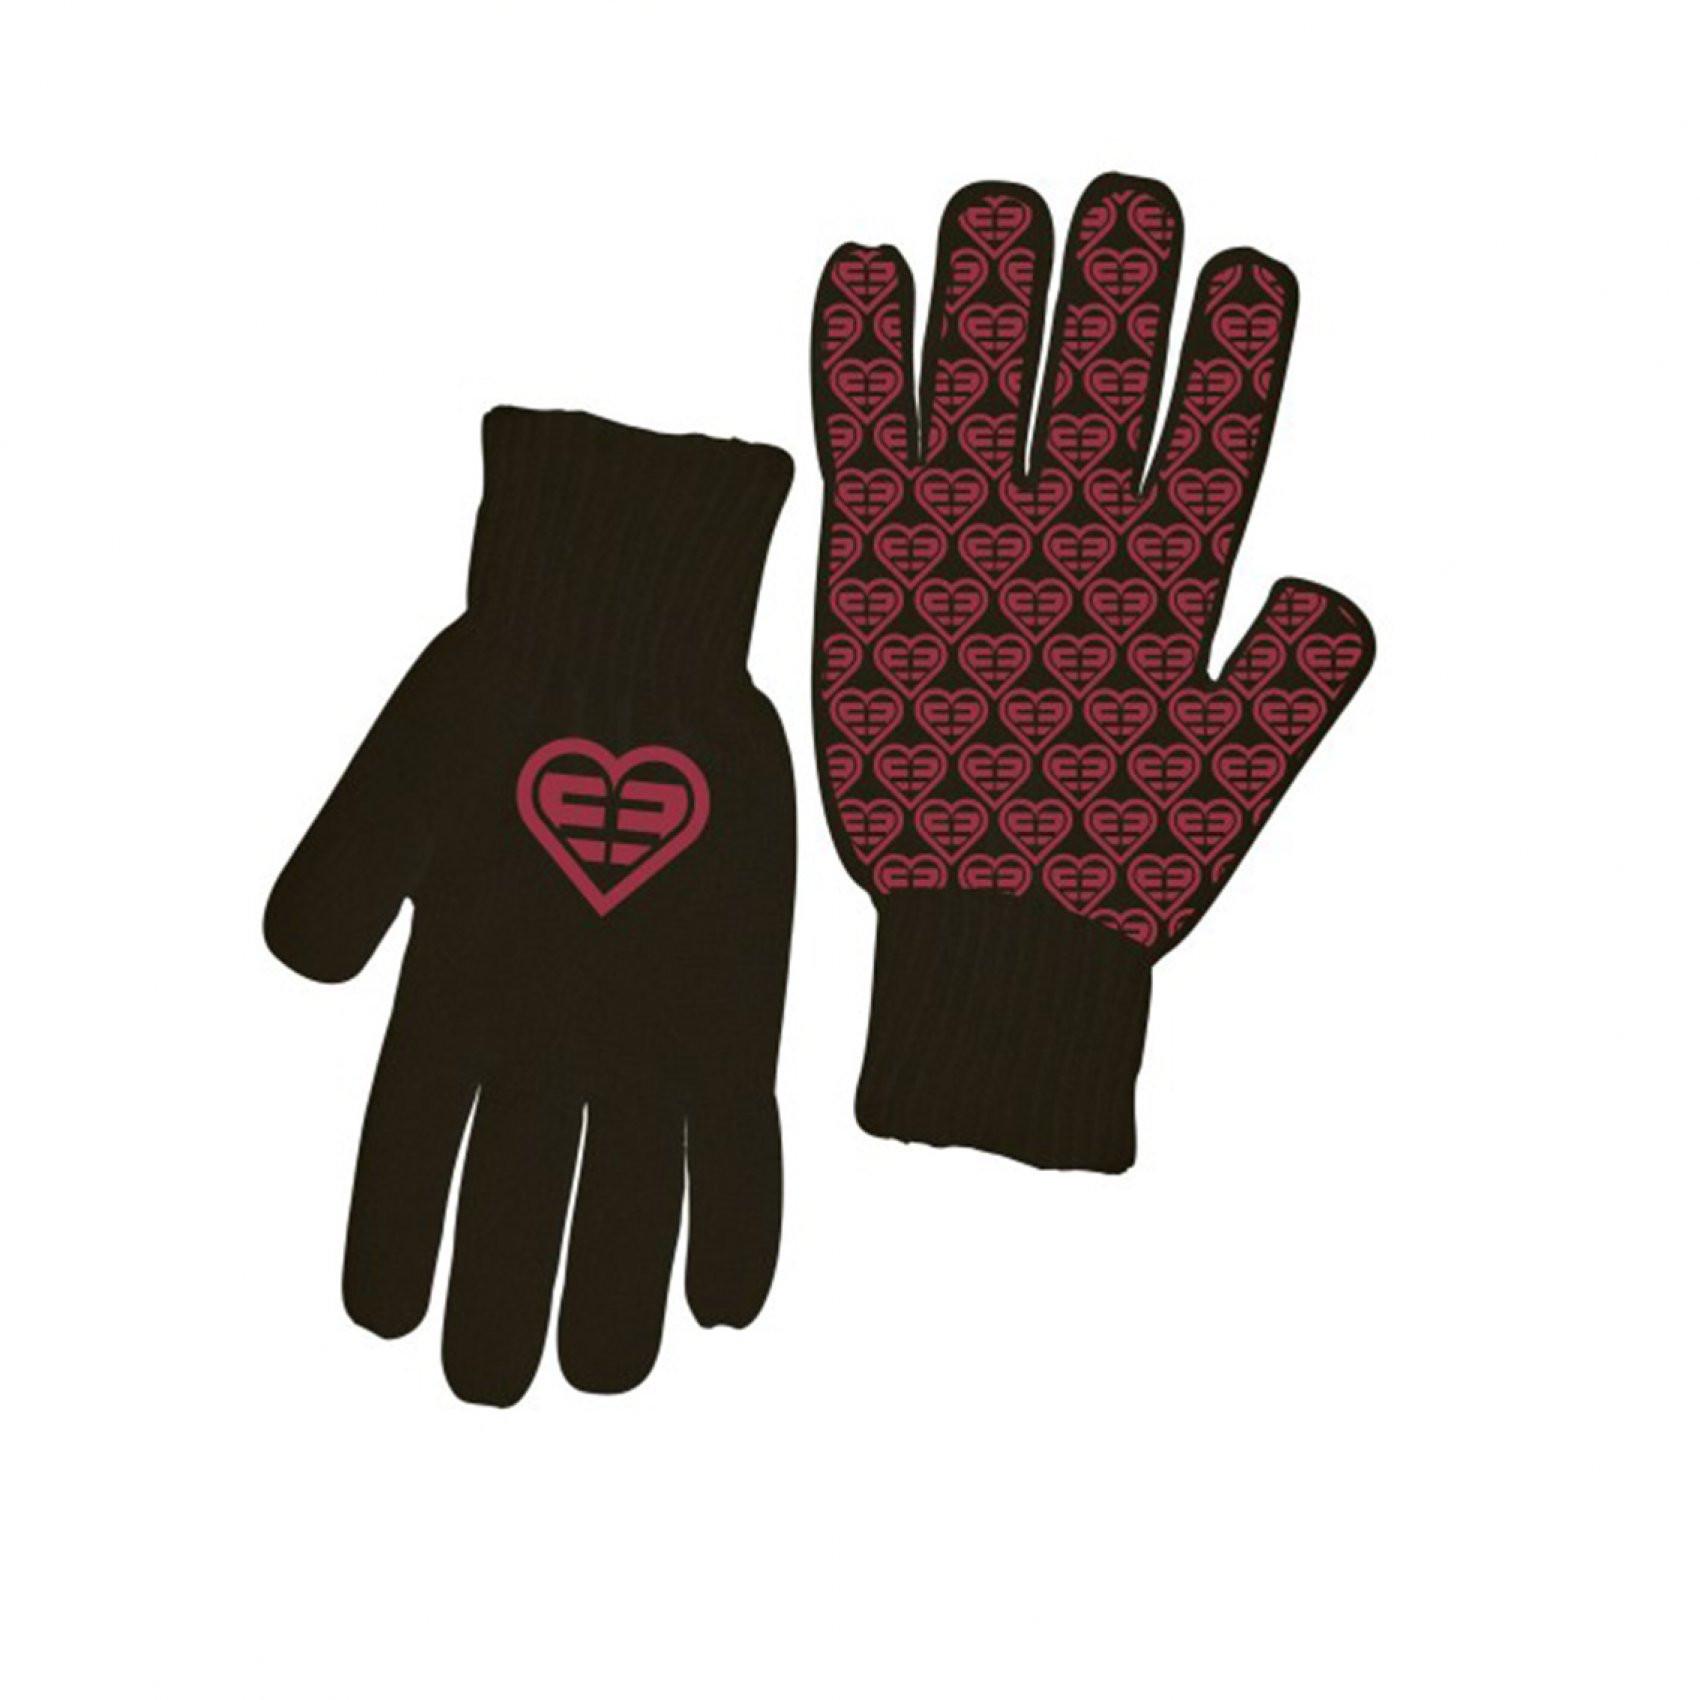 Paire de gants fille logo rose freegun (photo)